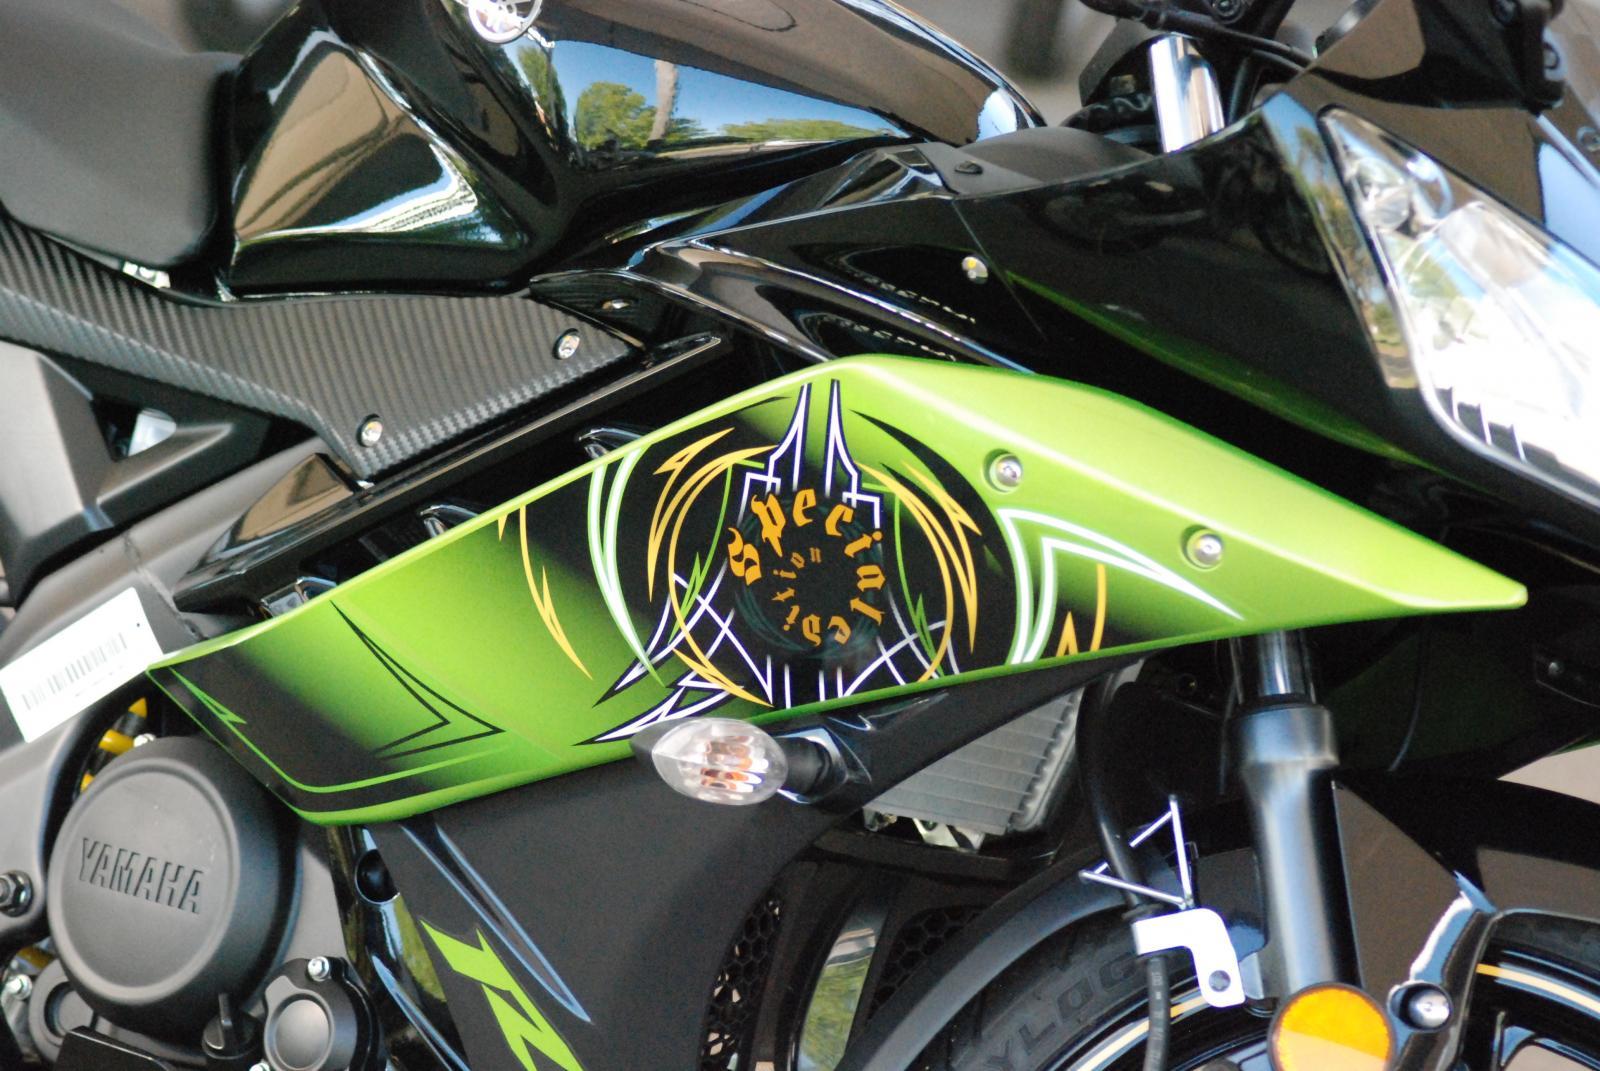 yamaha r15 v2 0 arrives at inverell motorcycles inverell motorcycles